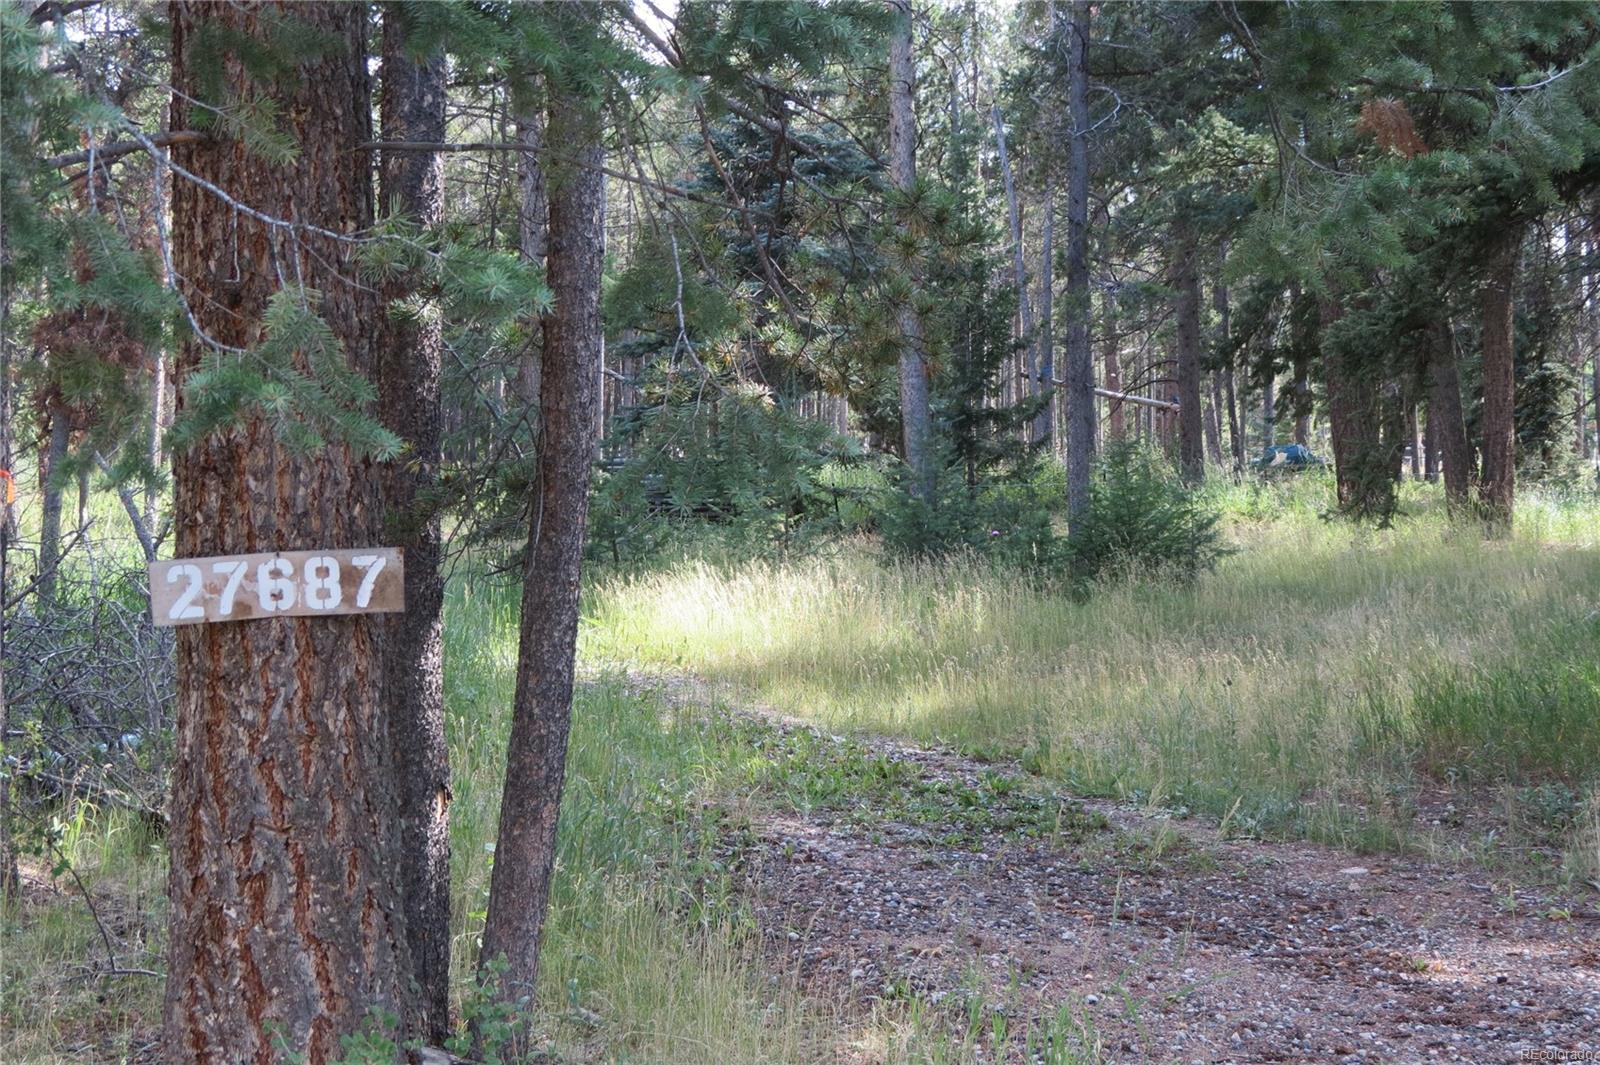 27687 Pine Grove Trail, Conifer, CO 80433 - Conifer, CO real estate listing